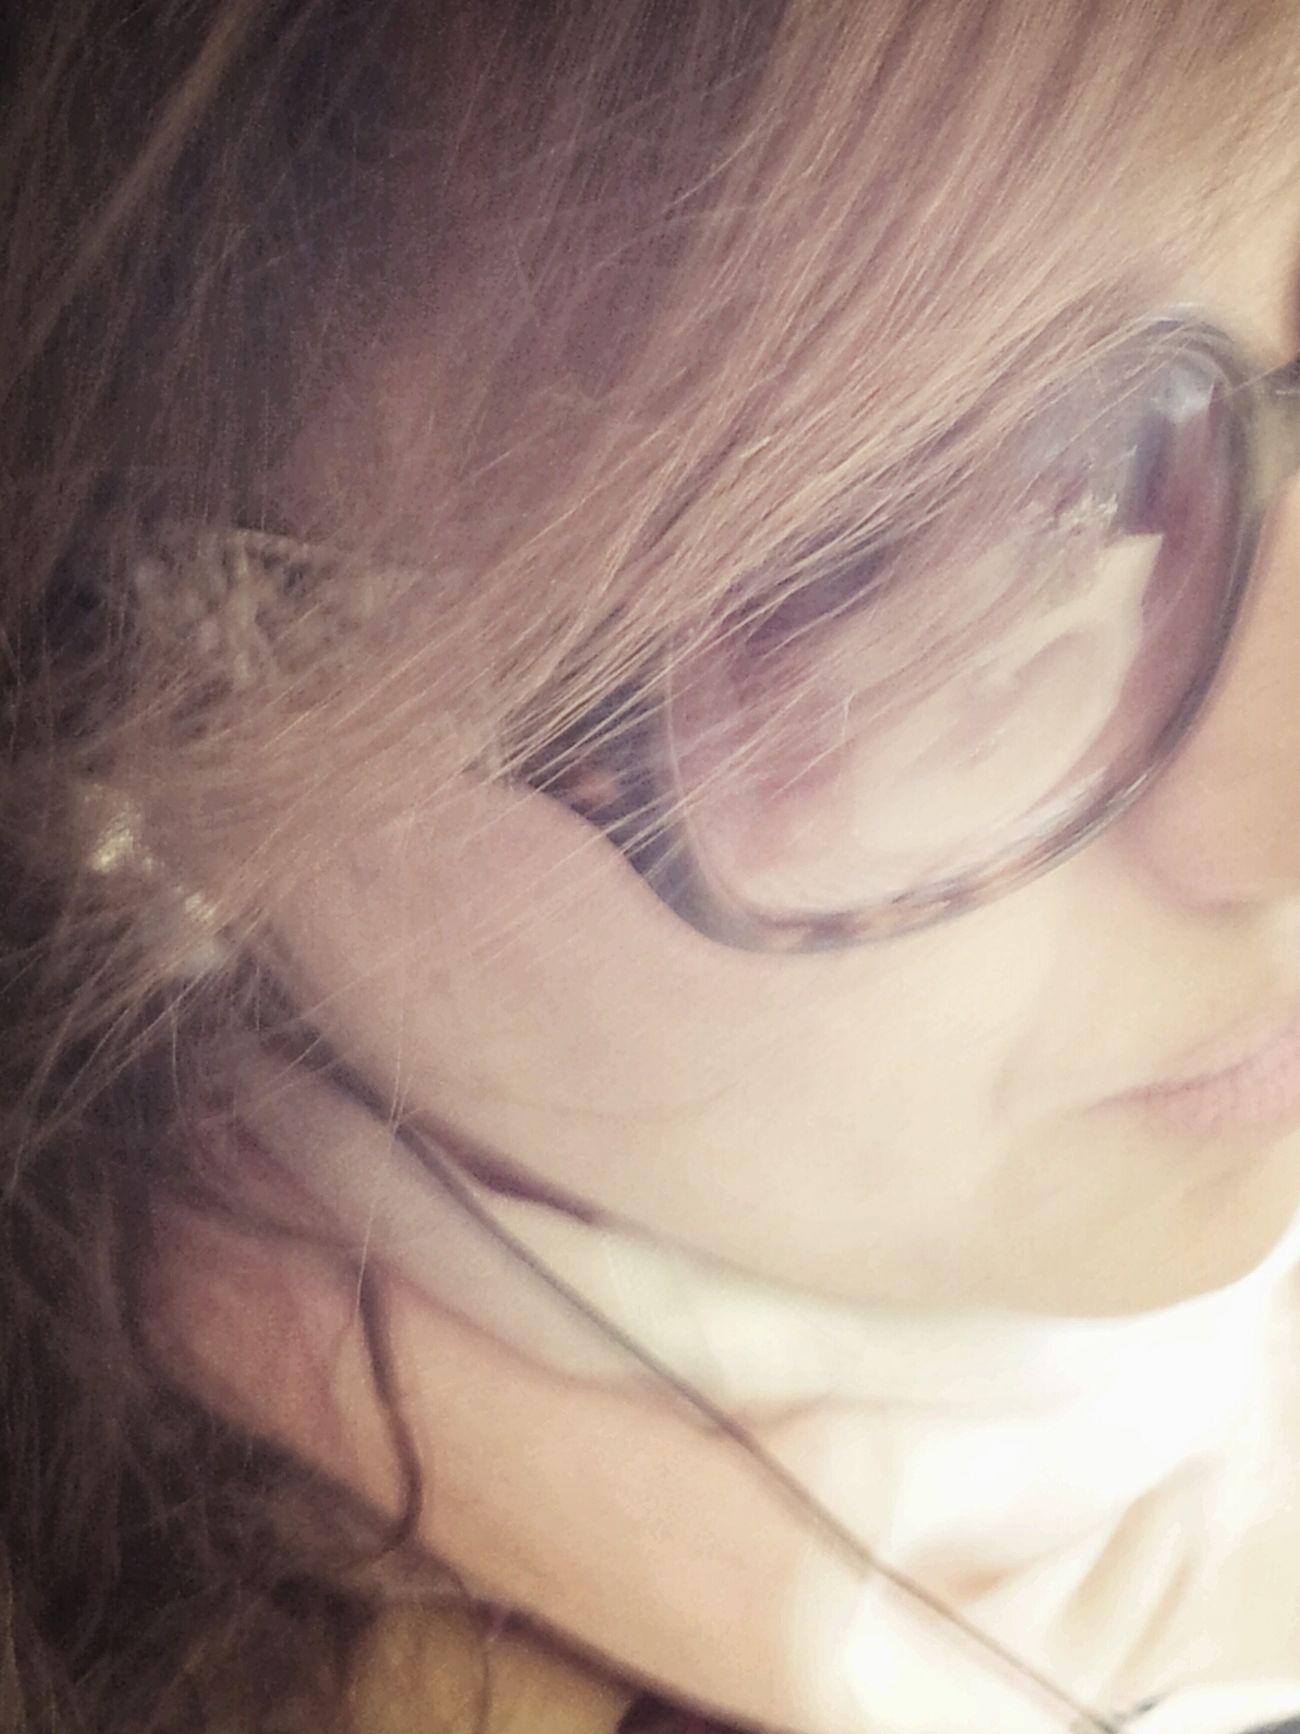 Thinking Selfportrait Sunclasses Samsung Galaxy Camera Madrid